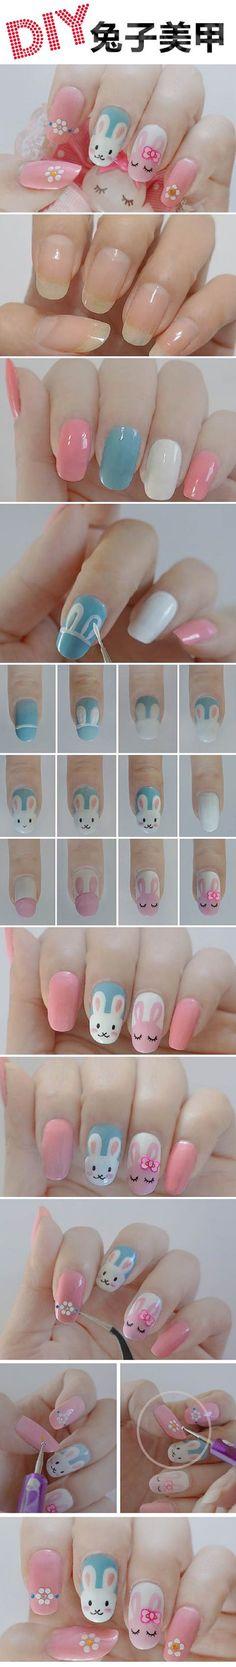 DIY Cute Rabbit Nail Art - 12 Easter-Inspired Nail Art Designs and Tutorials   GleamItUp